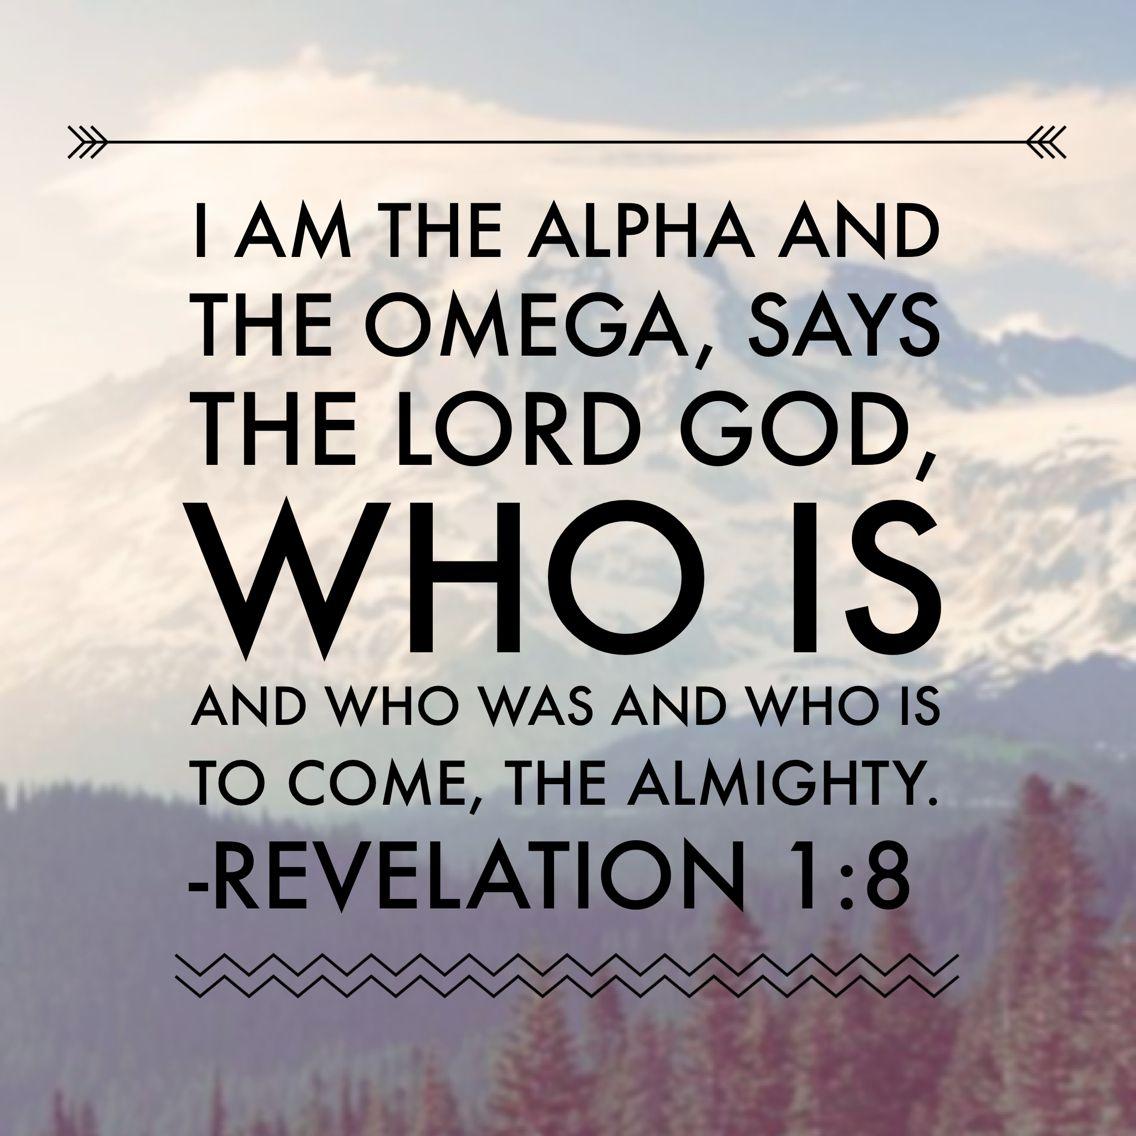 Revelation 1:8 #biblestudyfellowship